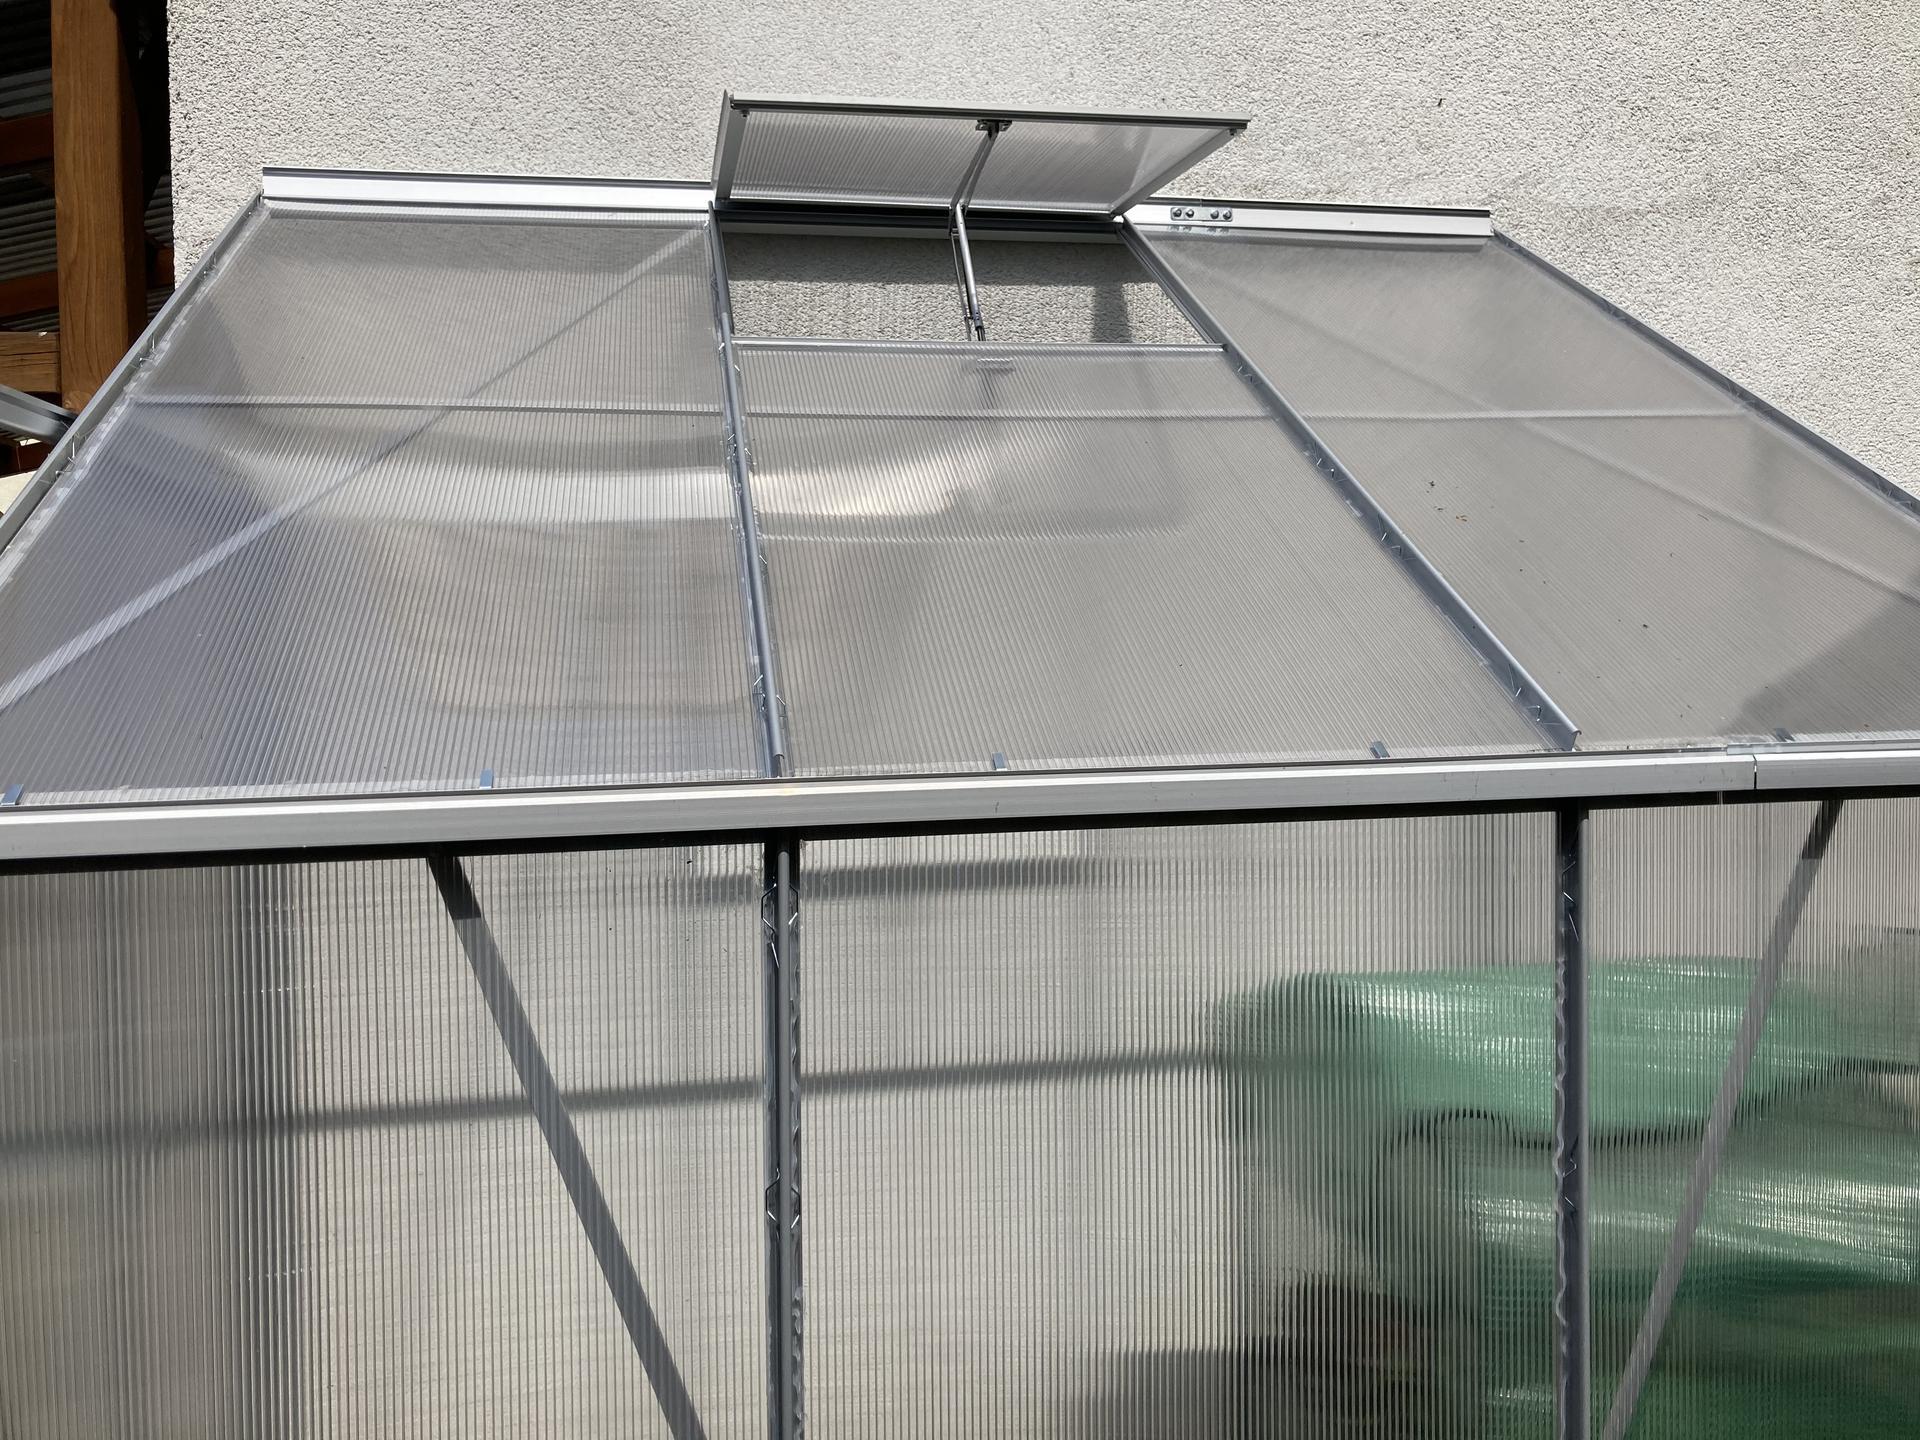 2021 🍀🤞🏻 - Automaticky otvirac okna konecne instalovan